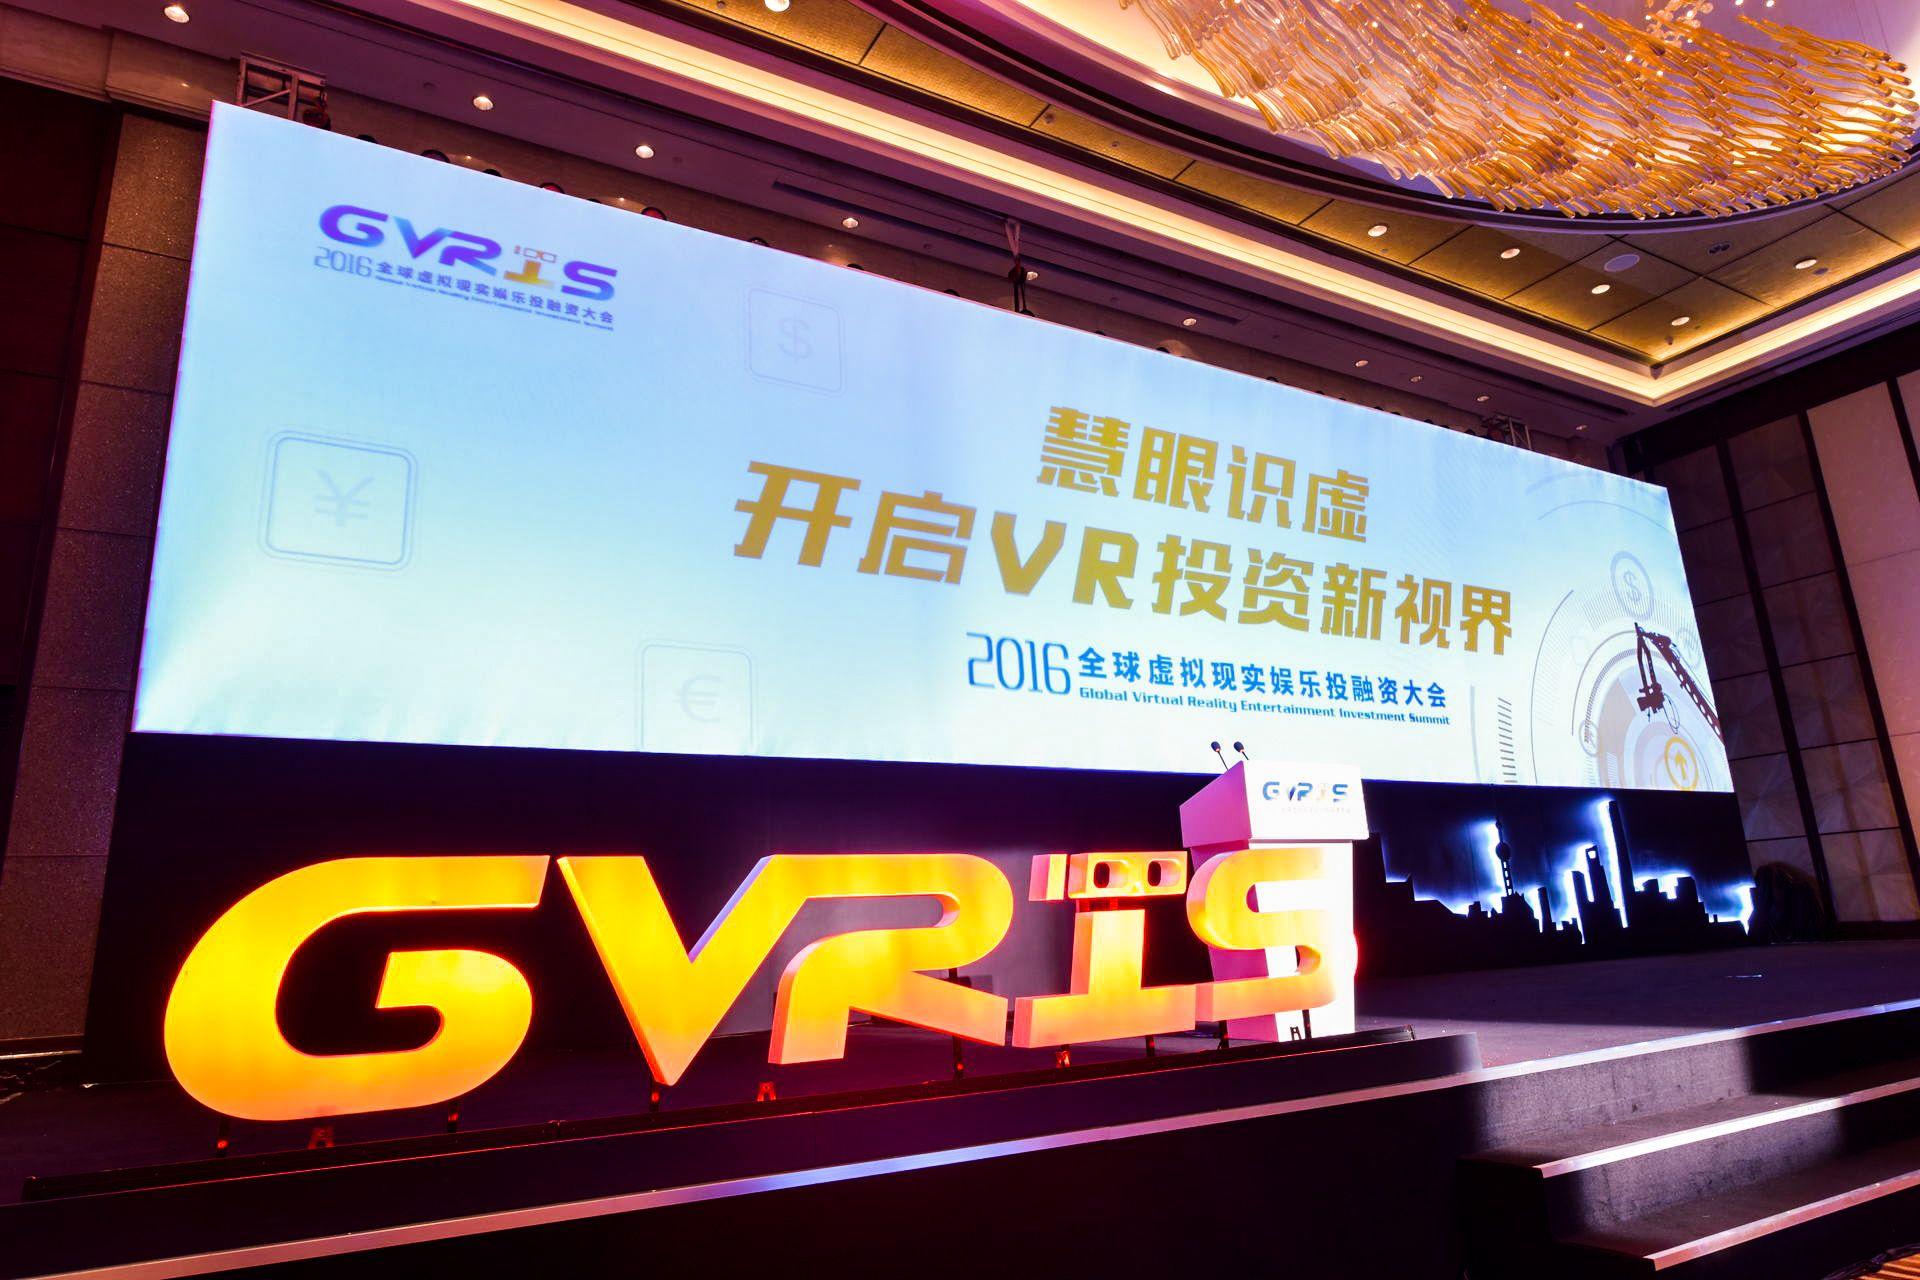 vive-x-vr-alvin-graylin-chinajoy-3